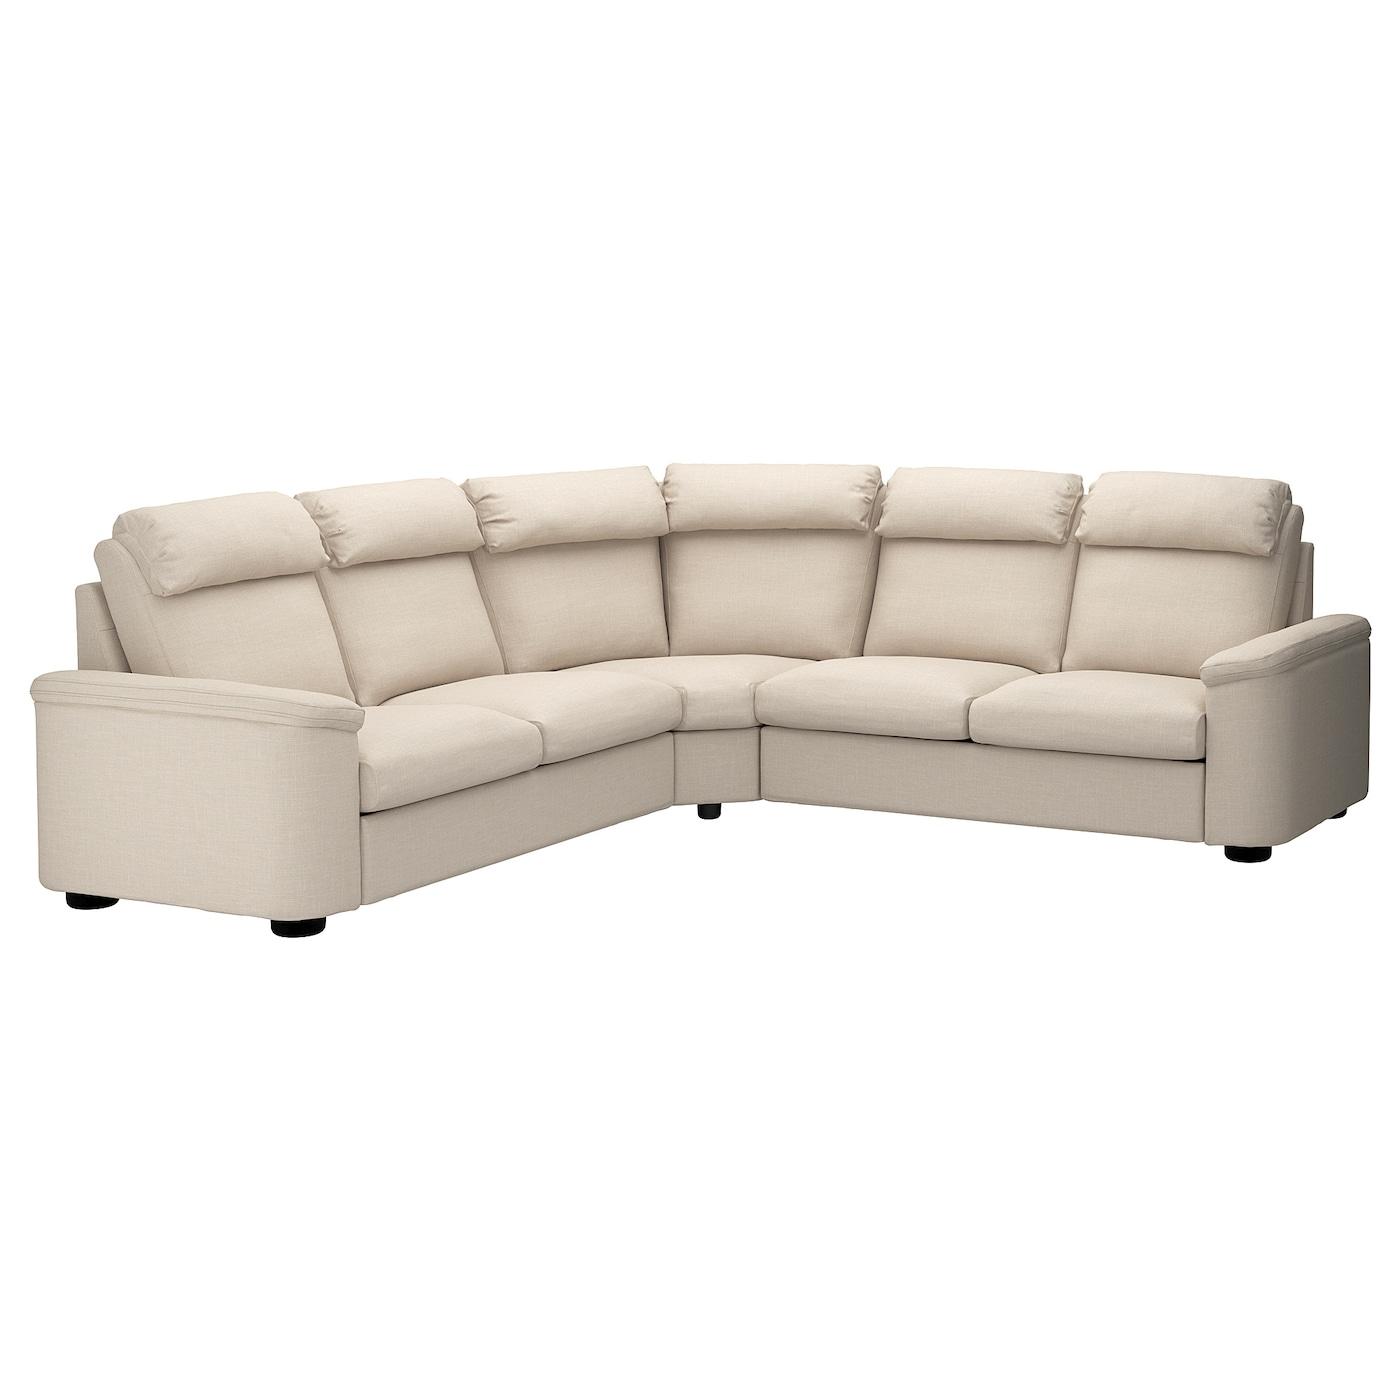 Peachy Lidhult Corner Sofa Bed 5 Seat Gassebol Light Beige Download Free Architecture Designs Ogrambritishbridgeorg